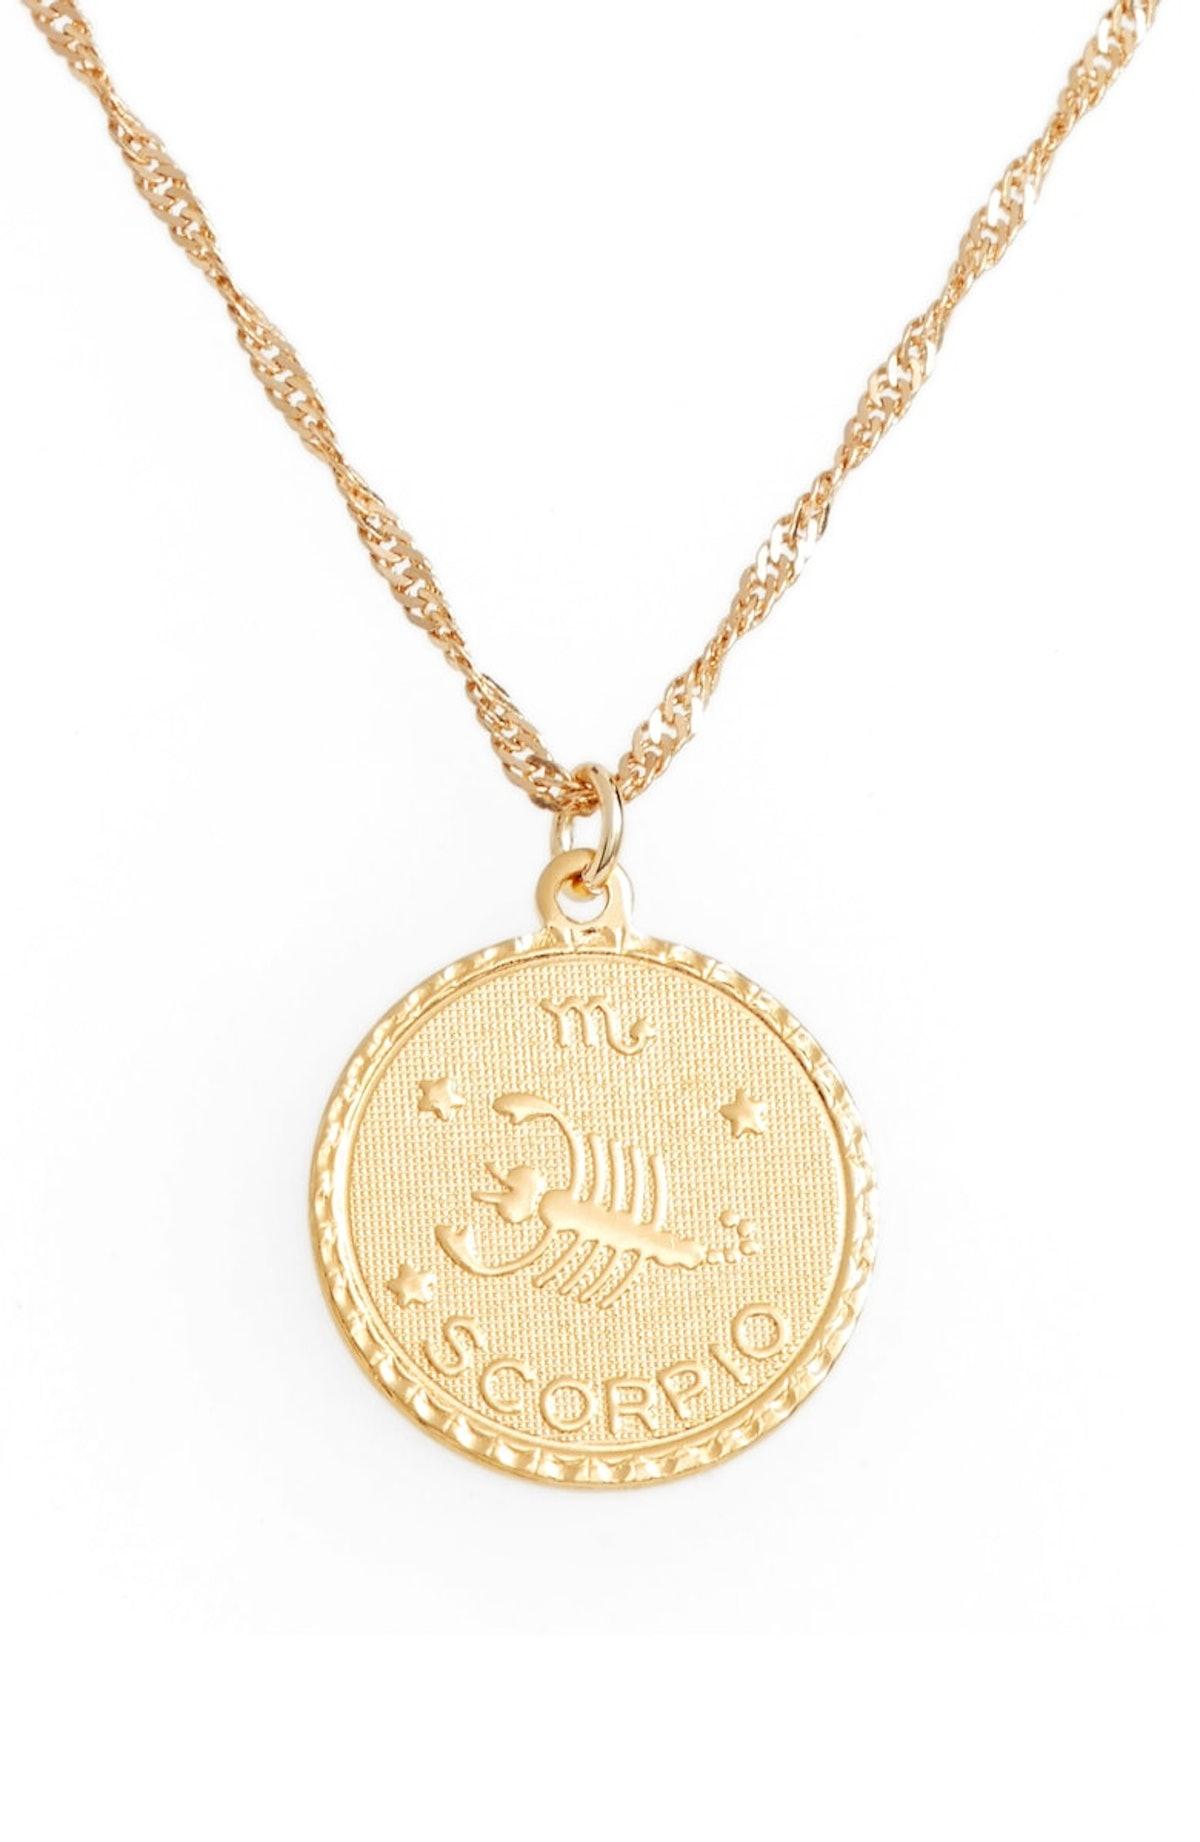 Ascending Zodiac Medallion Necklace